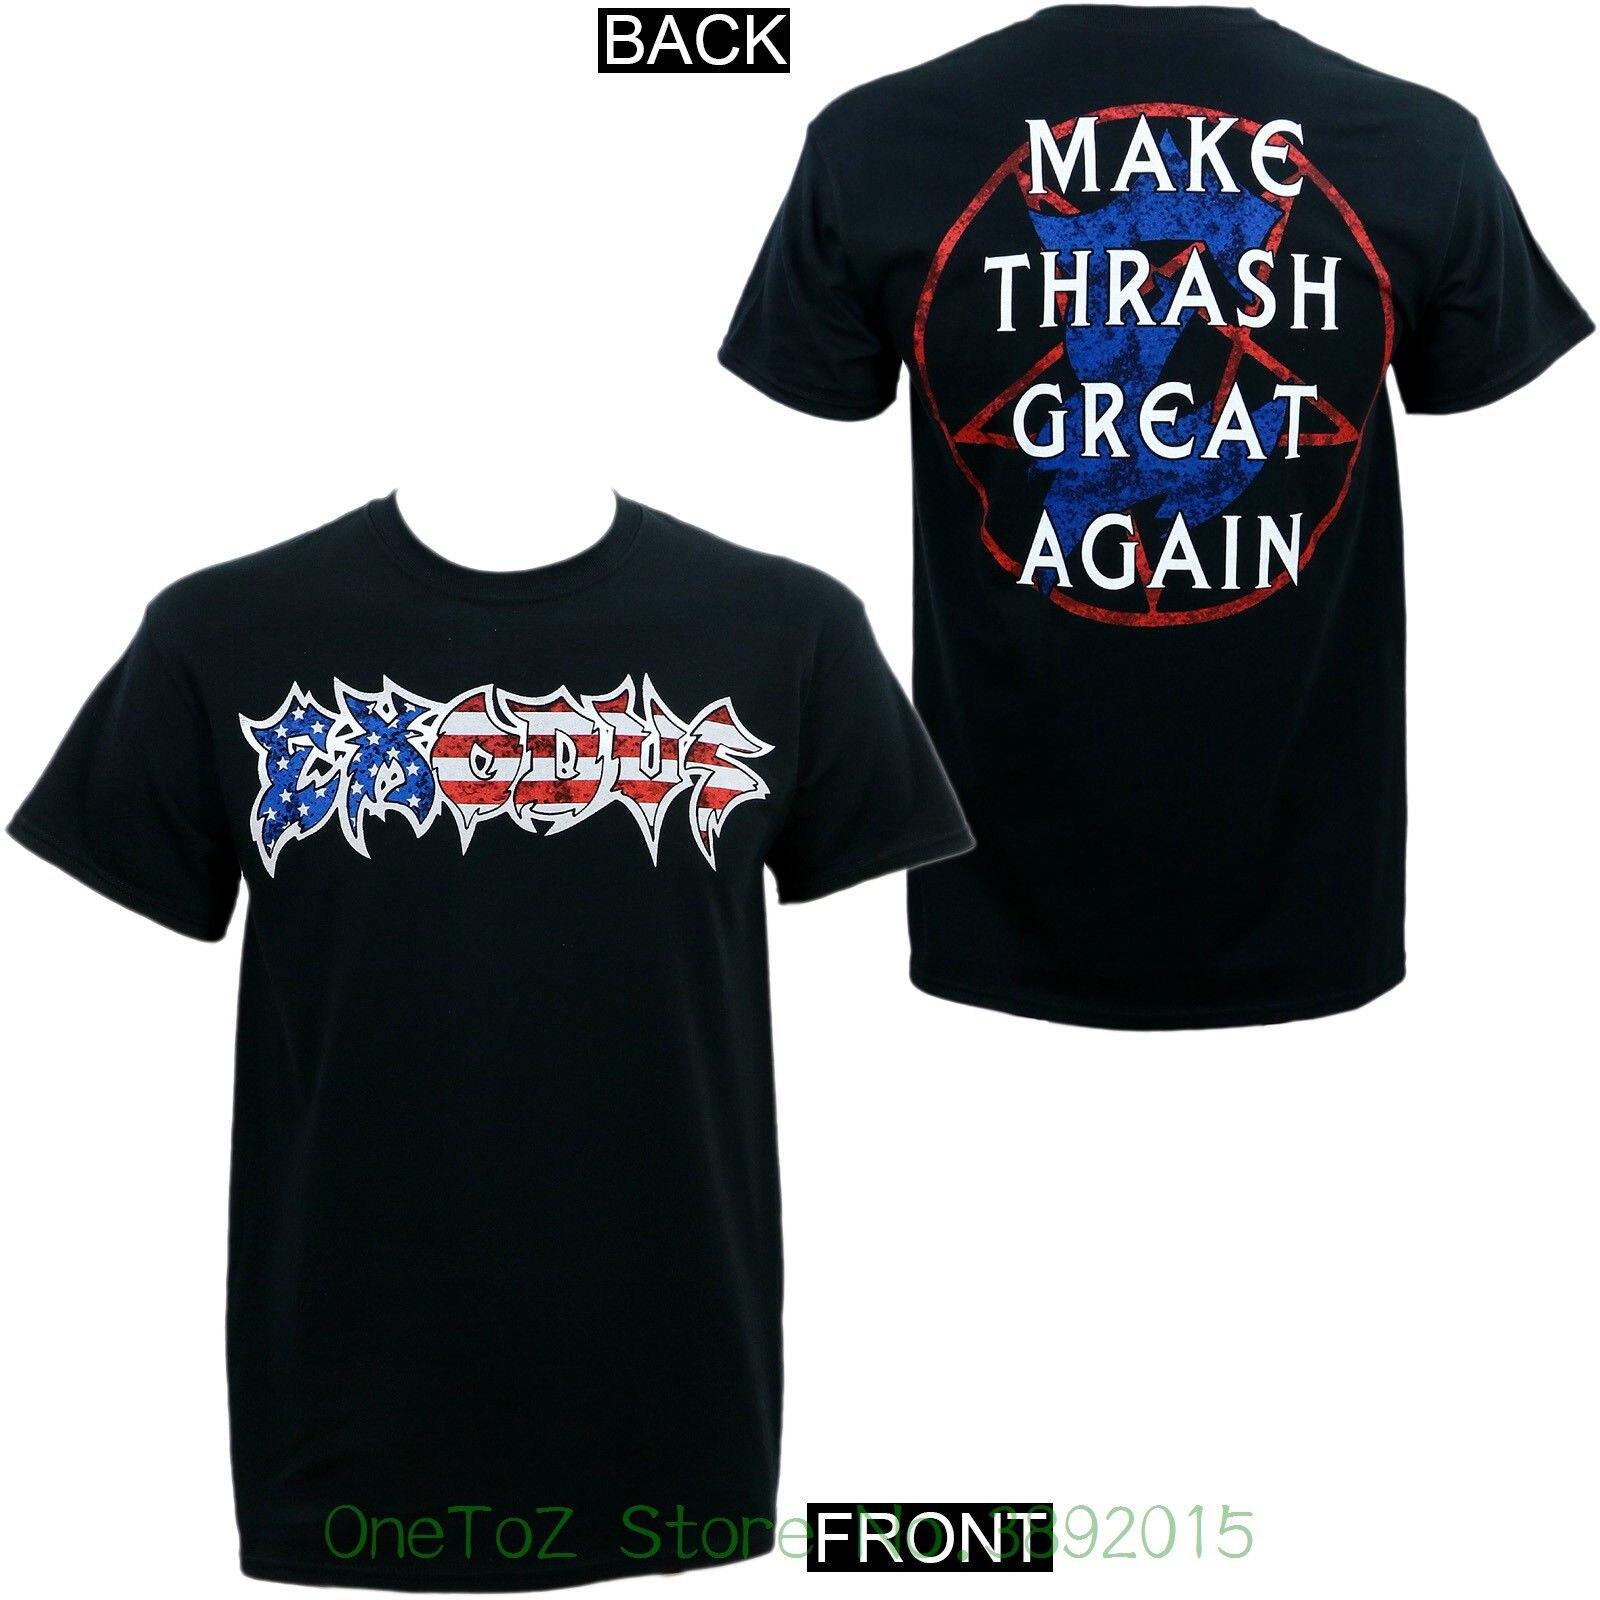 Sleeve Harajuku Tops Authentic Exodus Band Make Thrash Great Again American Logo T-shirt S - 2xl New